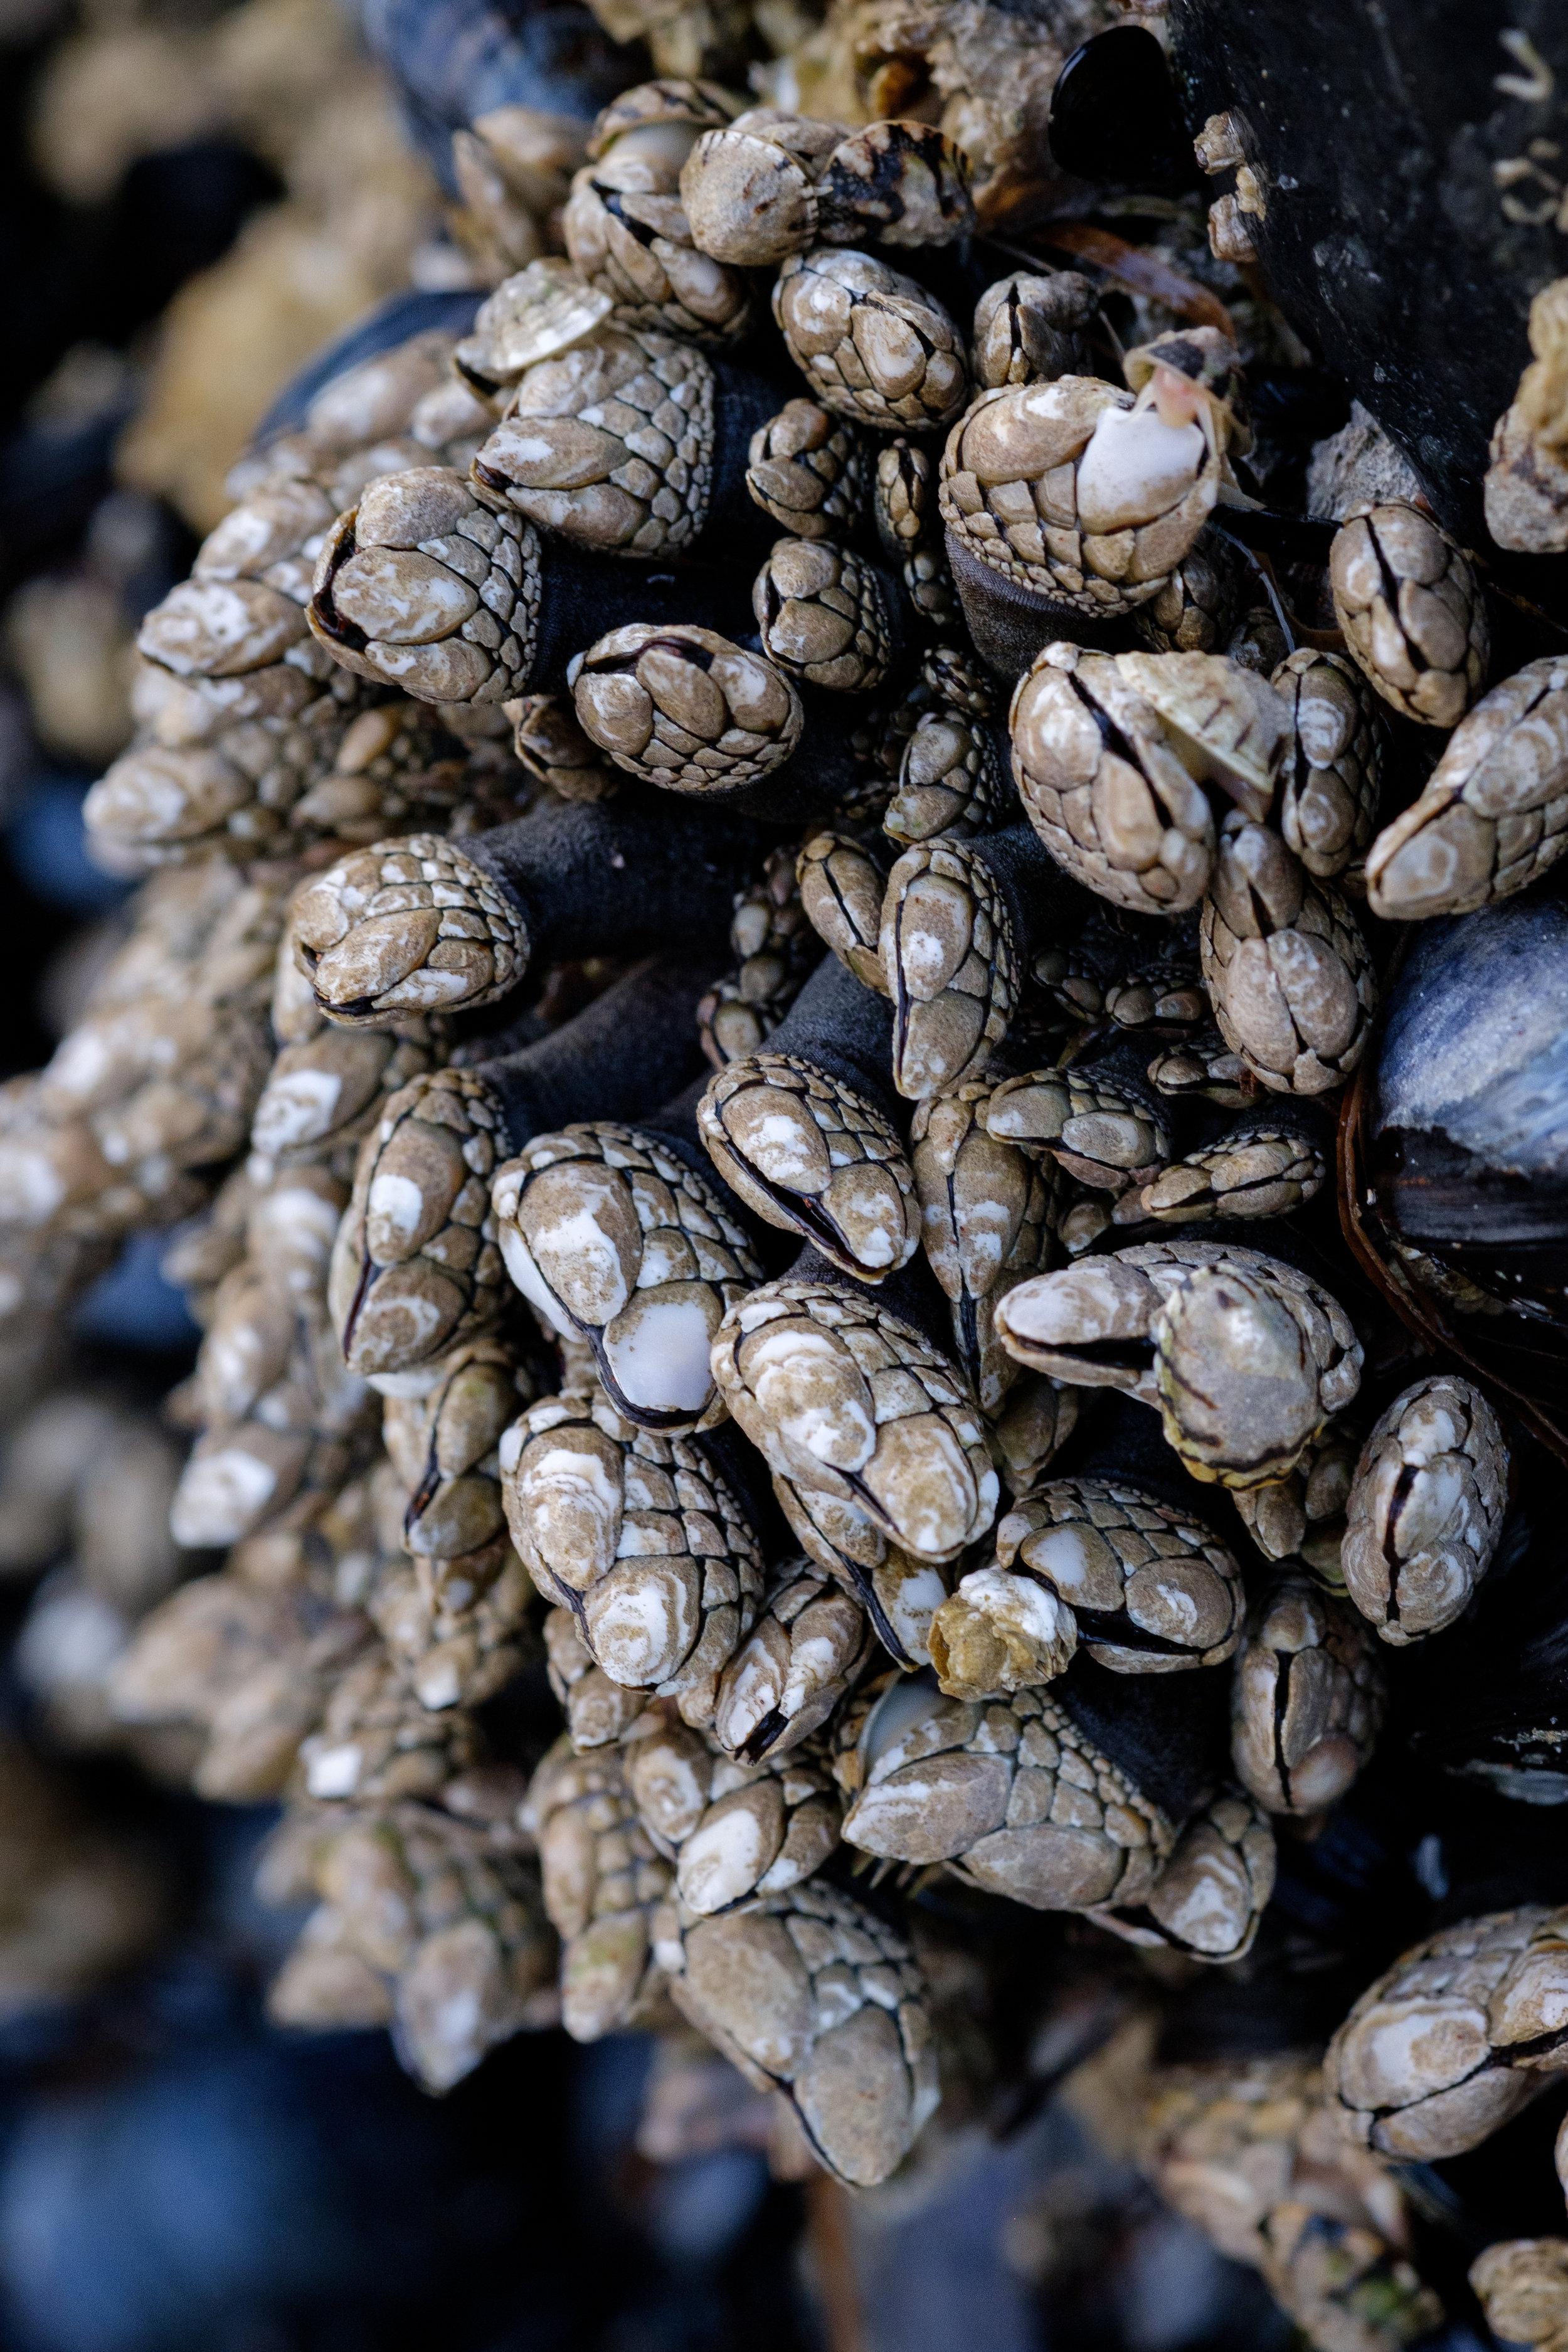 Gooseneck barnacles near Frank Island